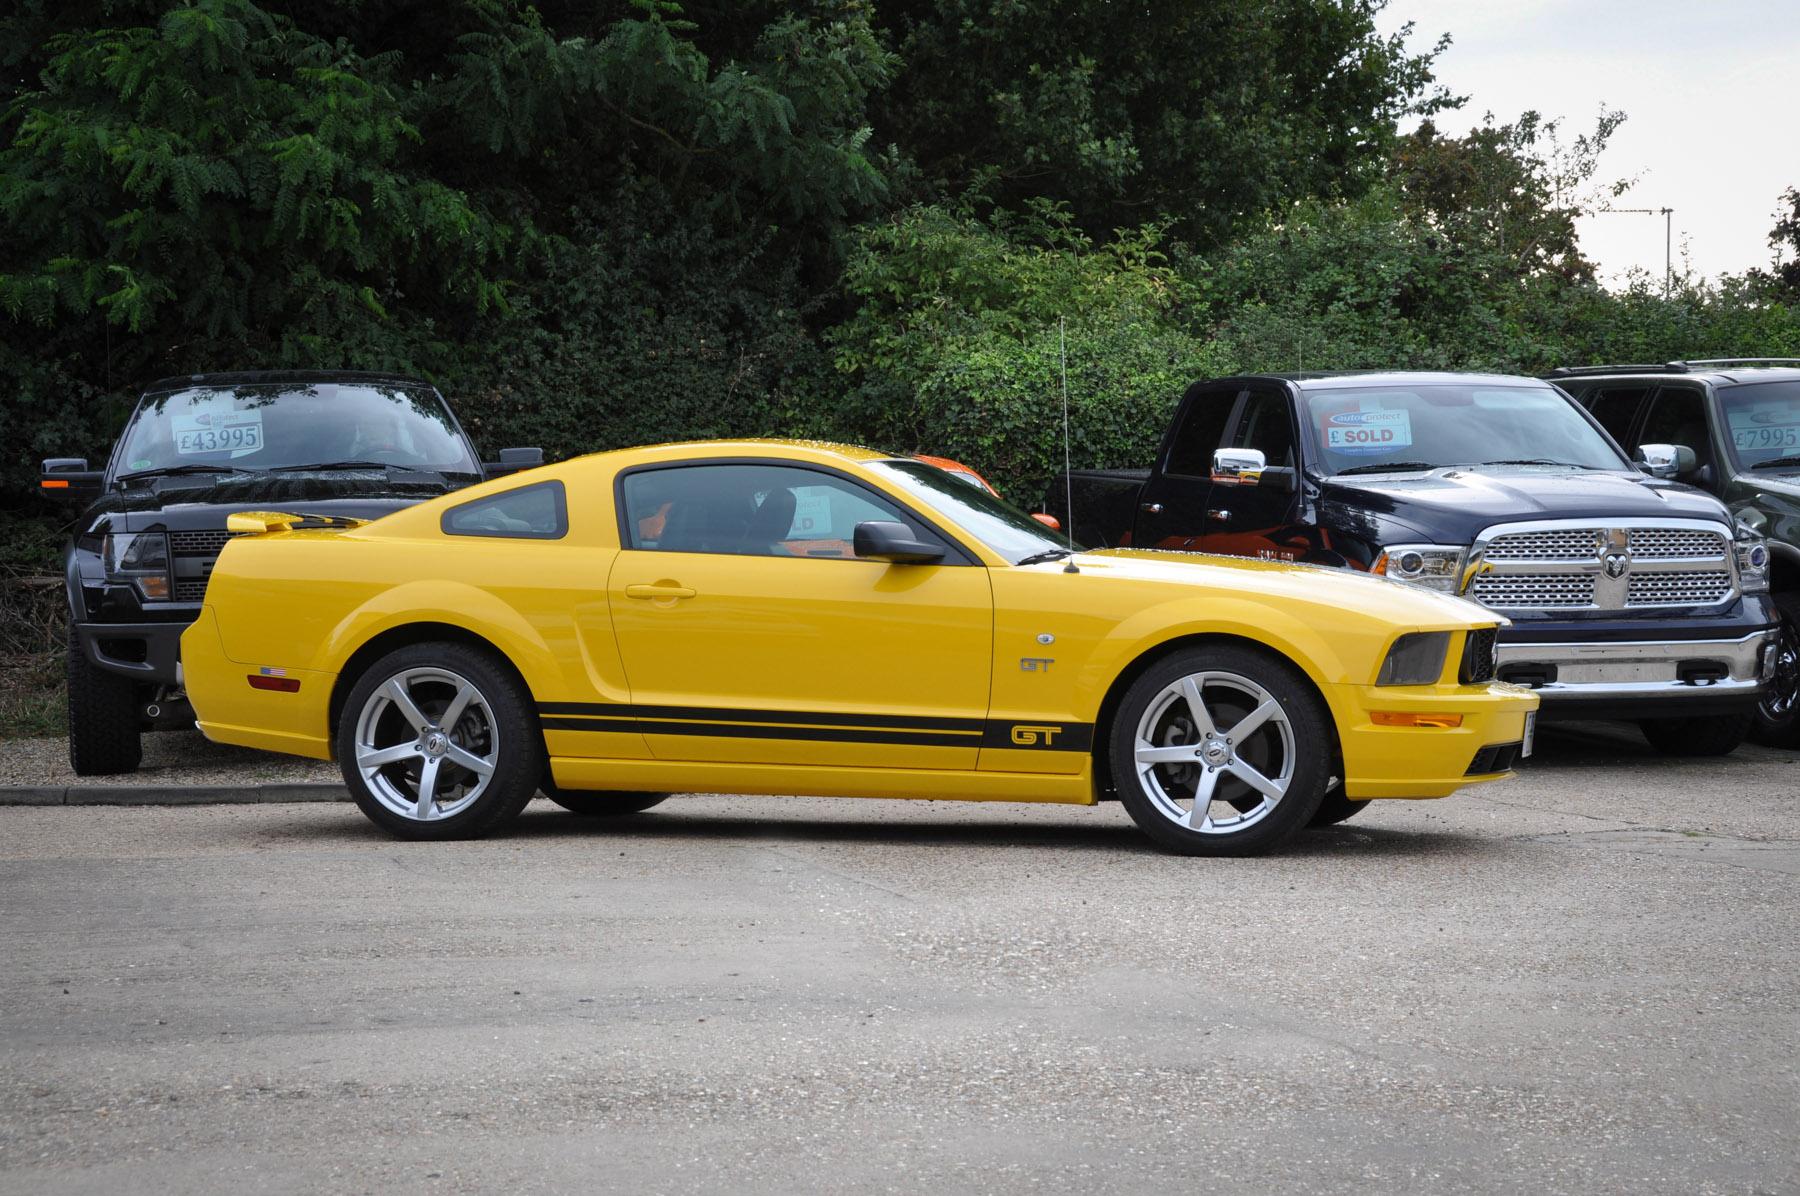 2005 (05) Ford Mustang V8 GT Premium Automatic – 32,000 miles – David Boatwright Partnership ...